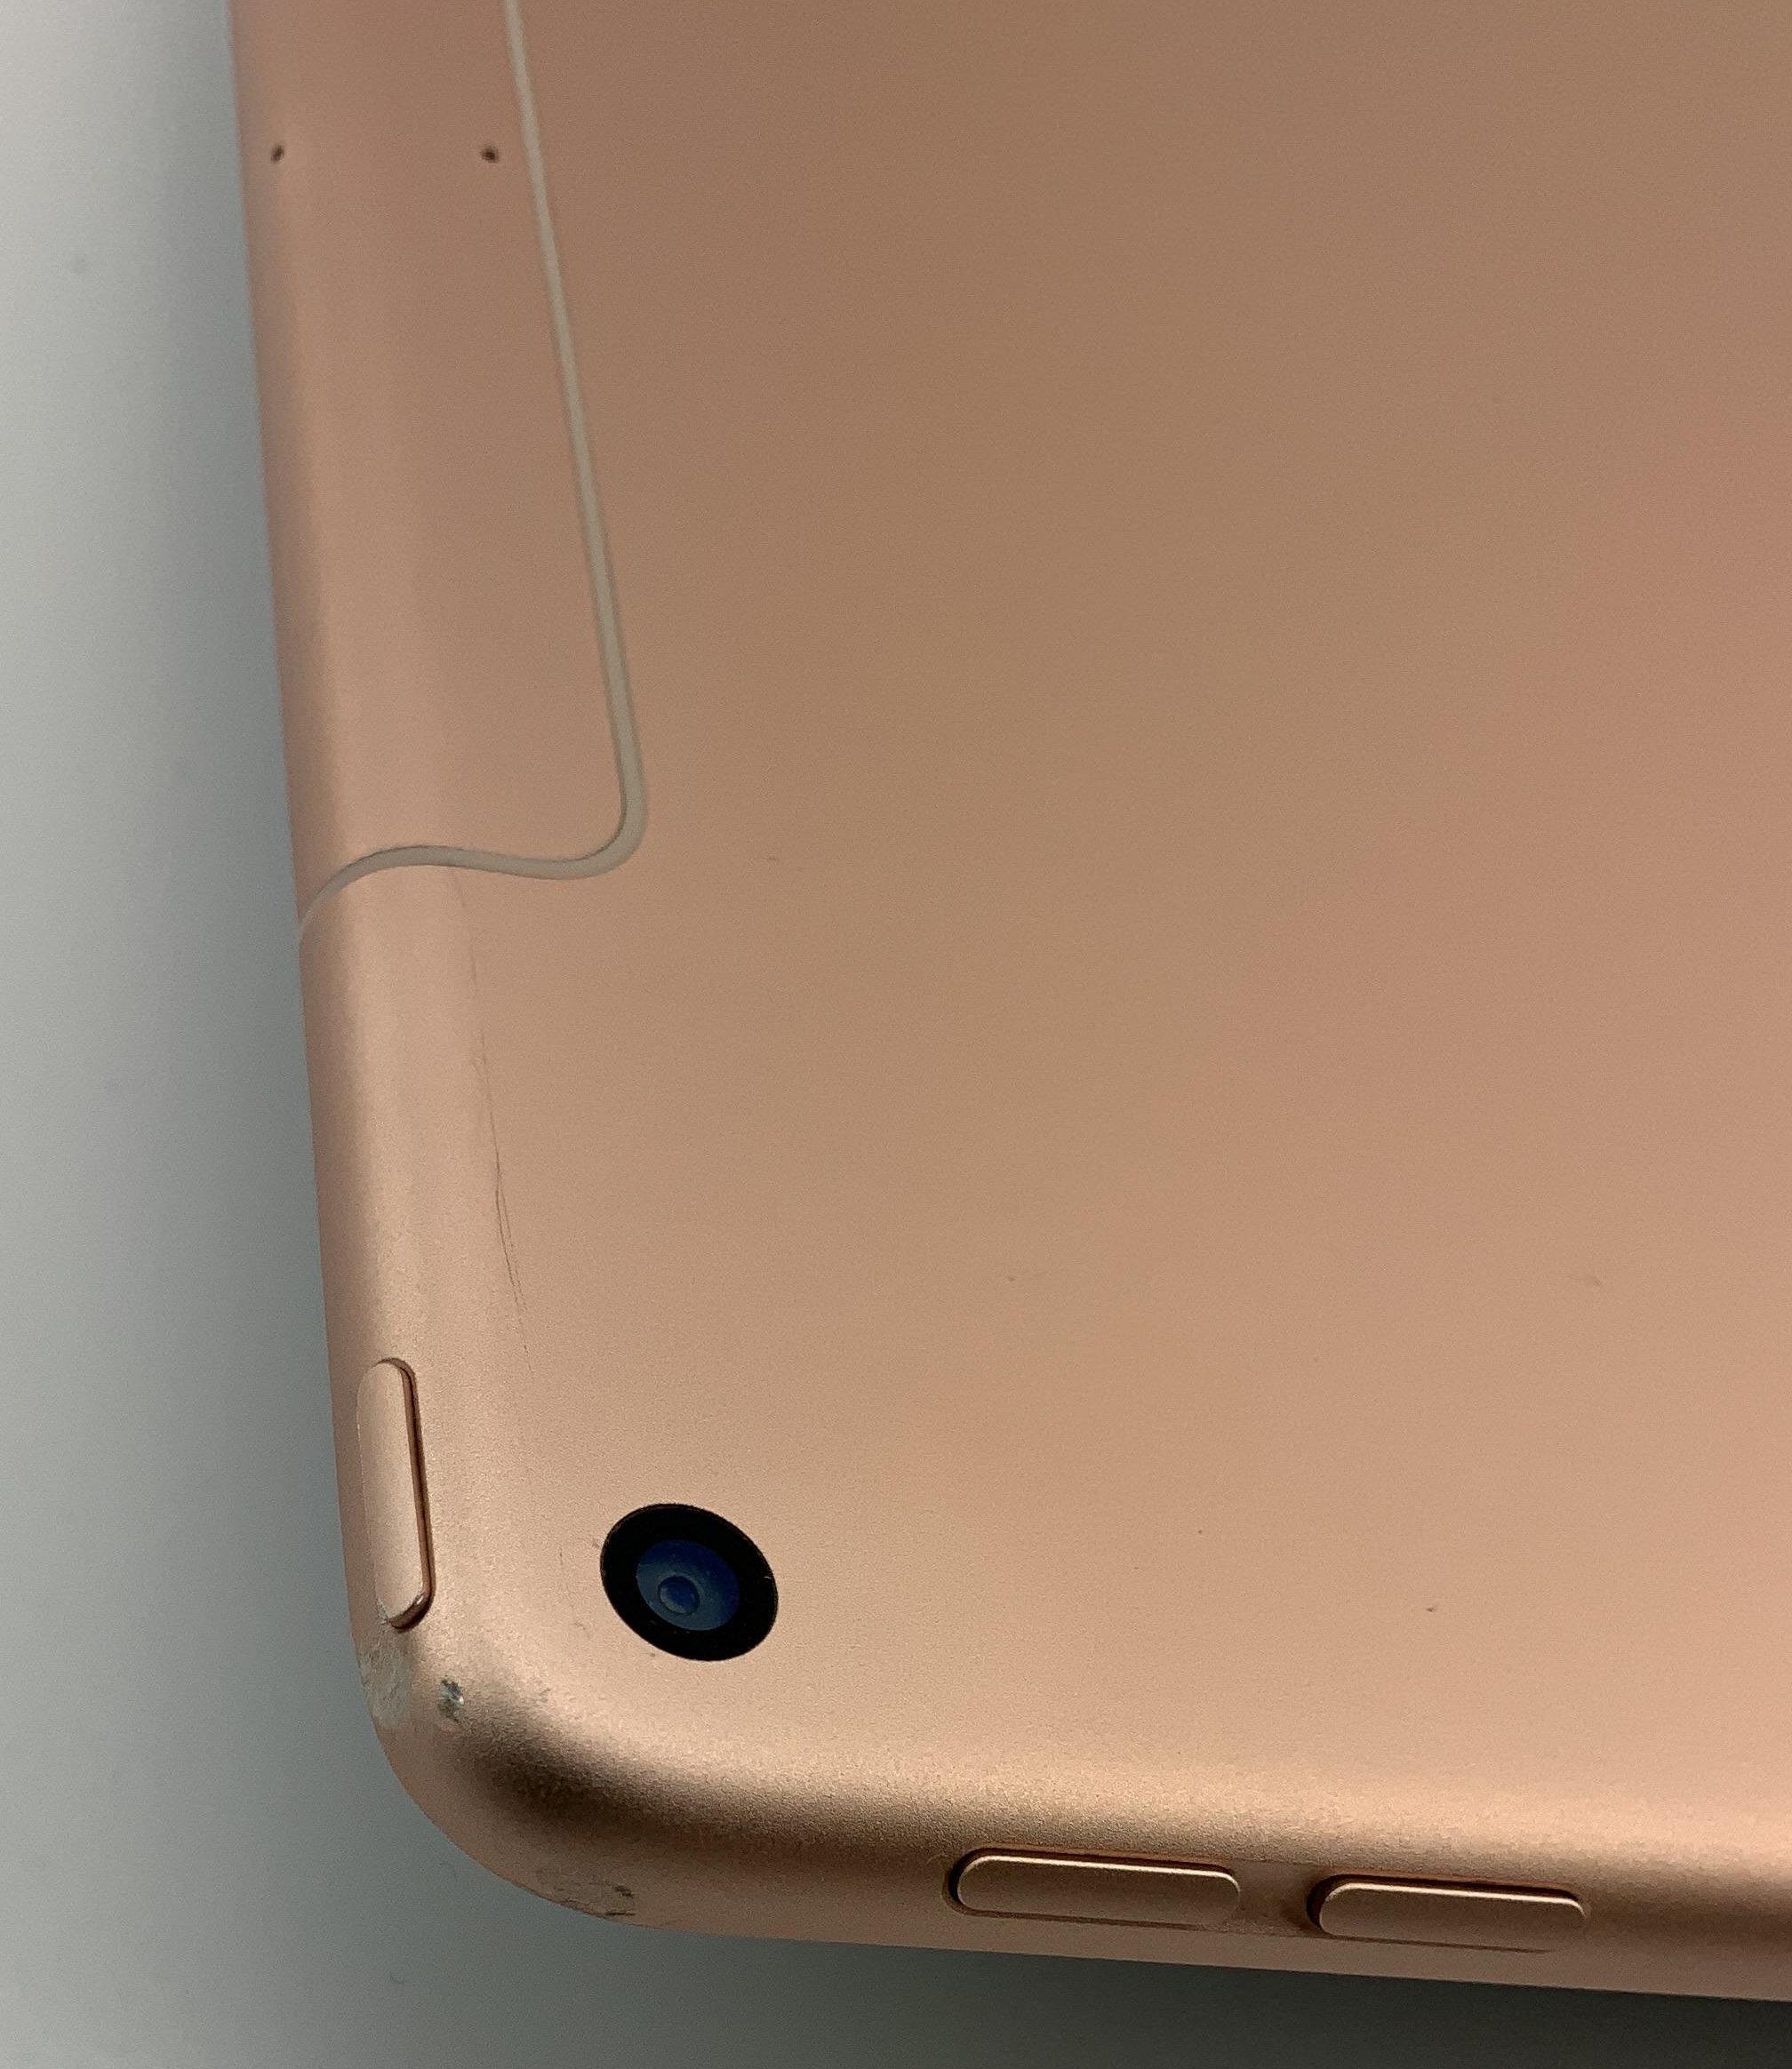 iPad Air 3 Wi-Fi + Cellular 256GB, 256GB, Gold, image 3